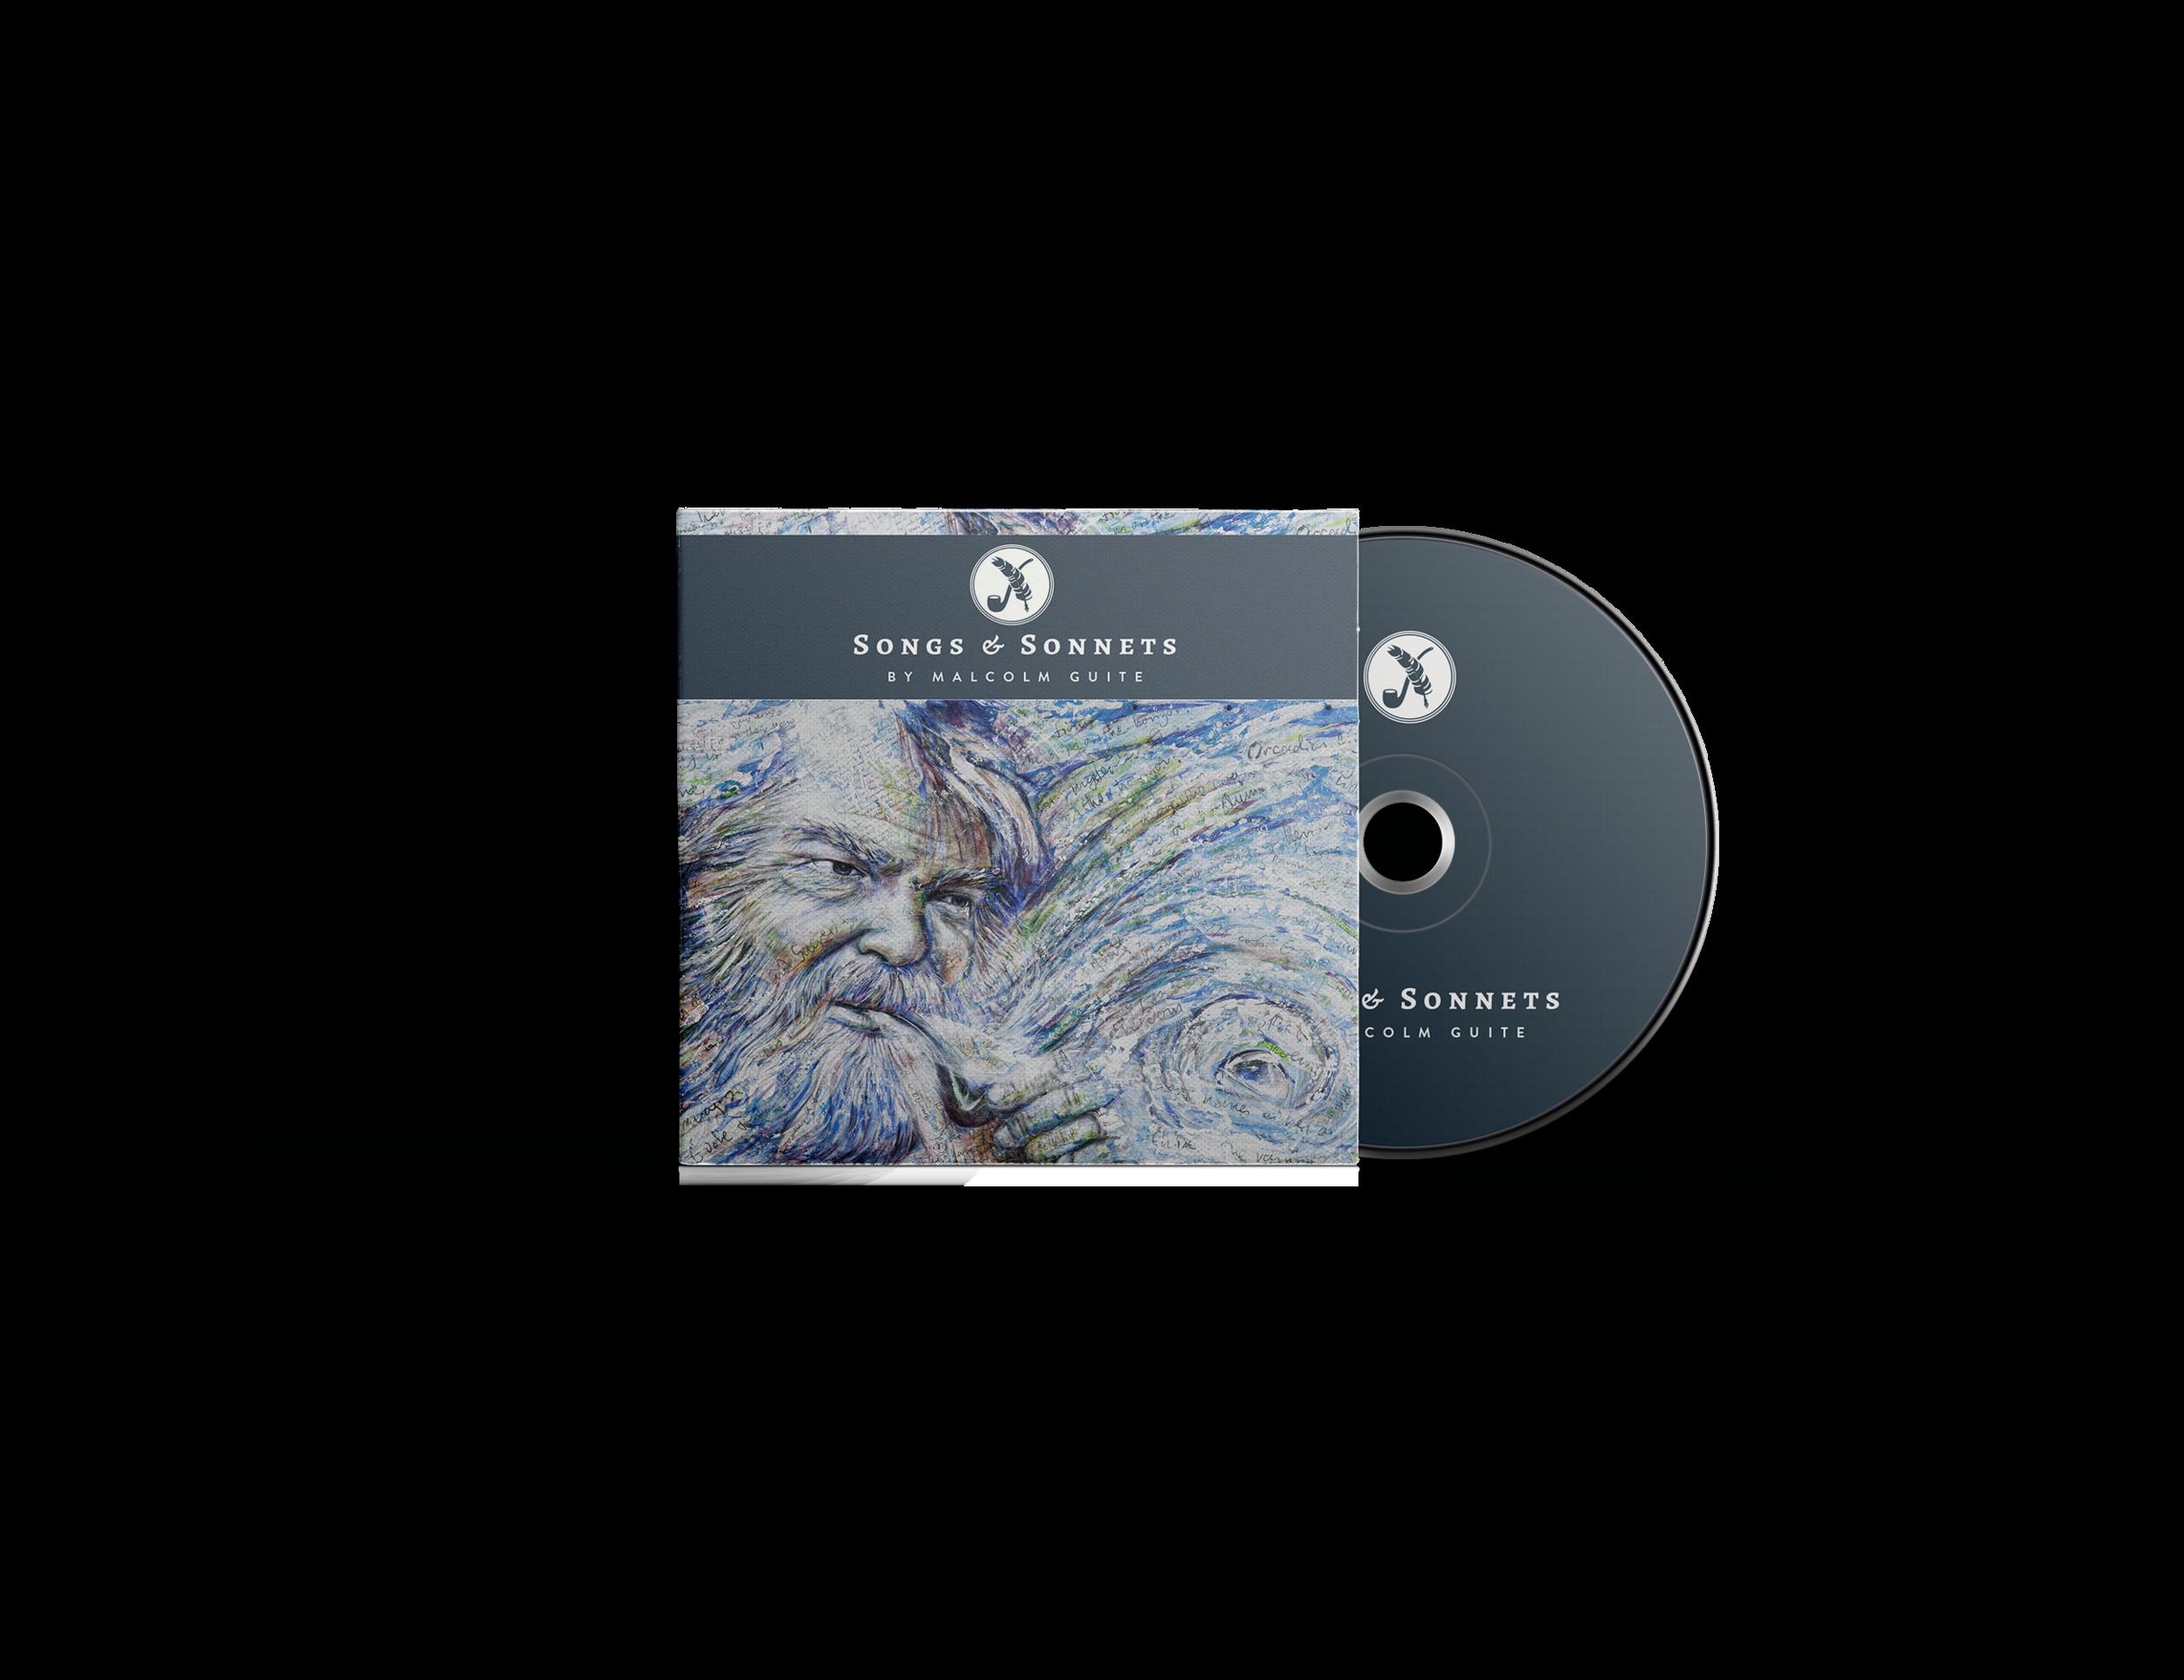 Songs & Sonnets – Guite Malcolm